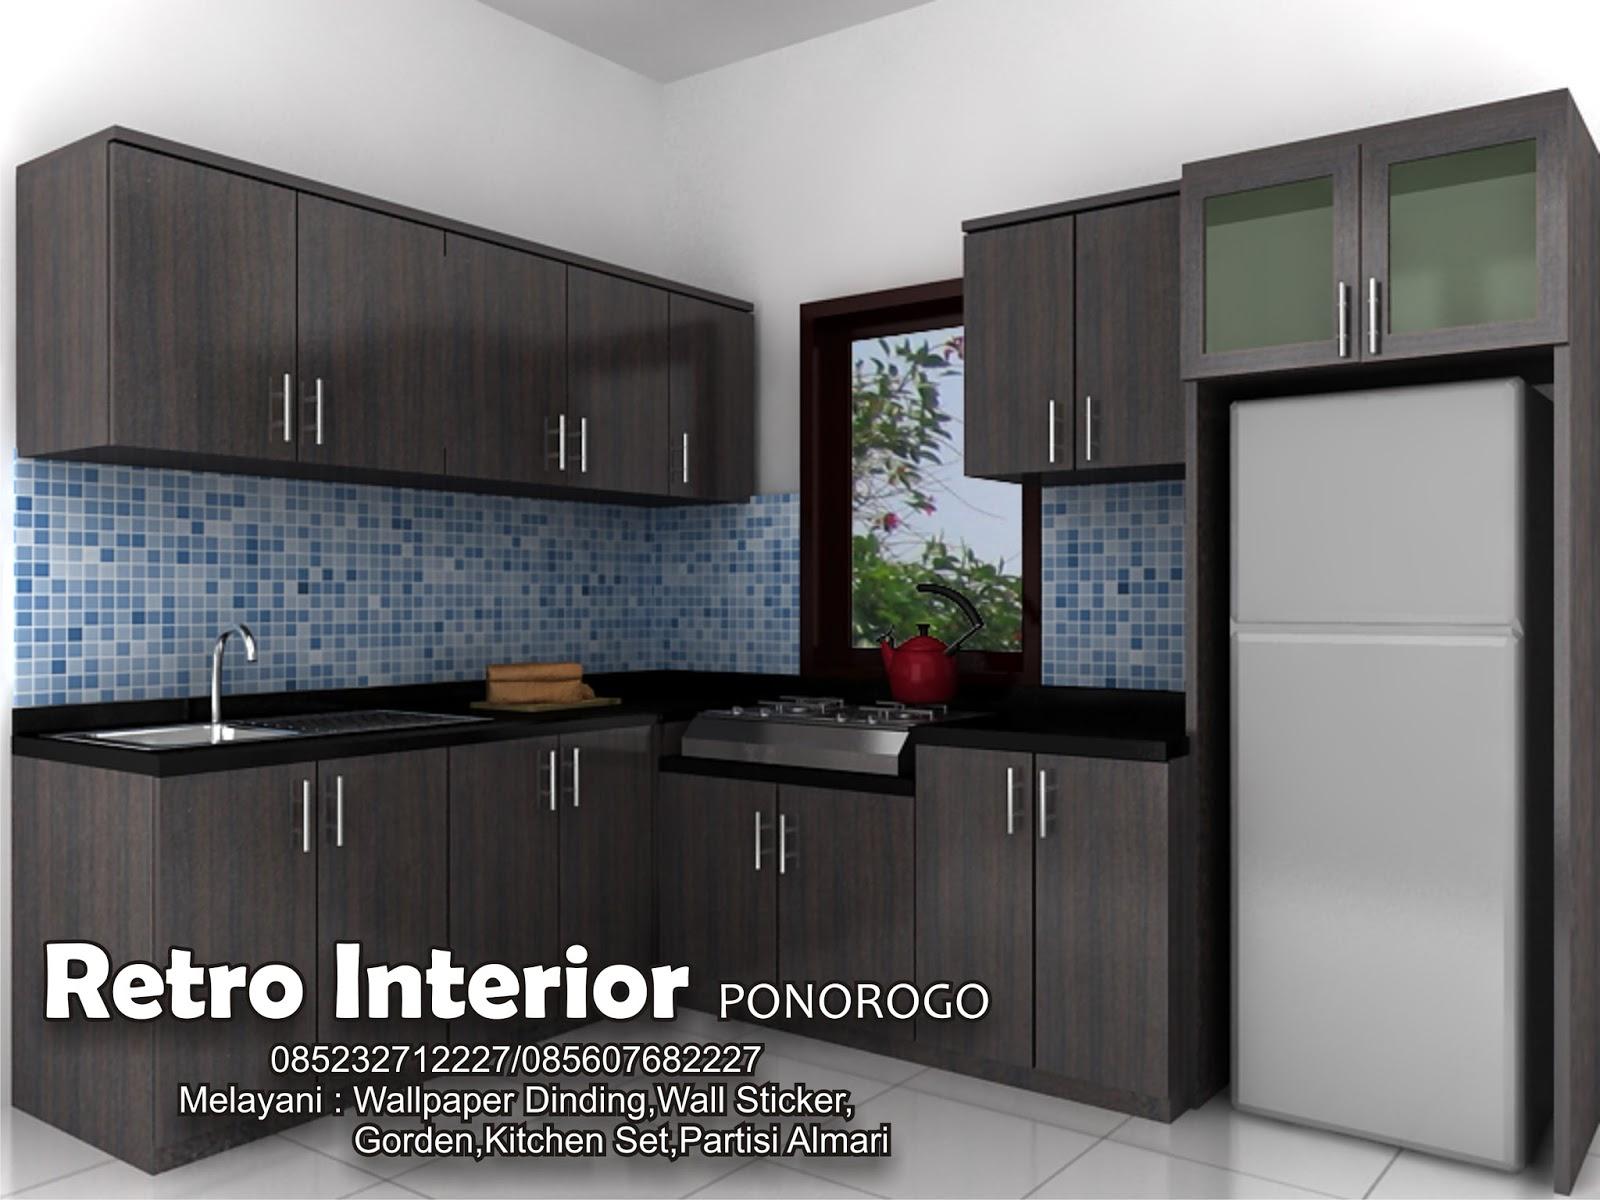 Retro Wallpaper Dinding Ponorogo Jl Thamrin 28 085607682227 085232712227 Pin Bb 5ecd728d Kitchen Set